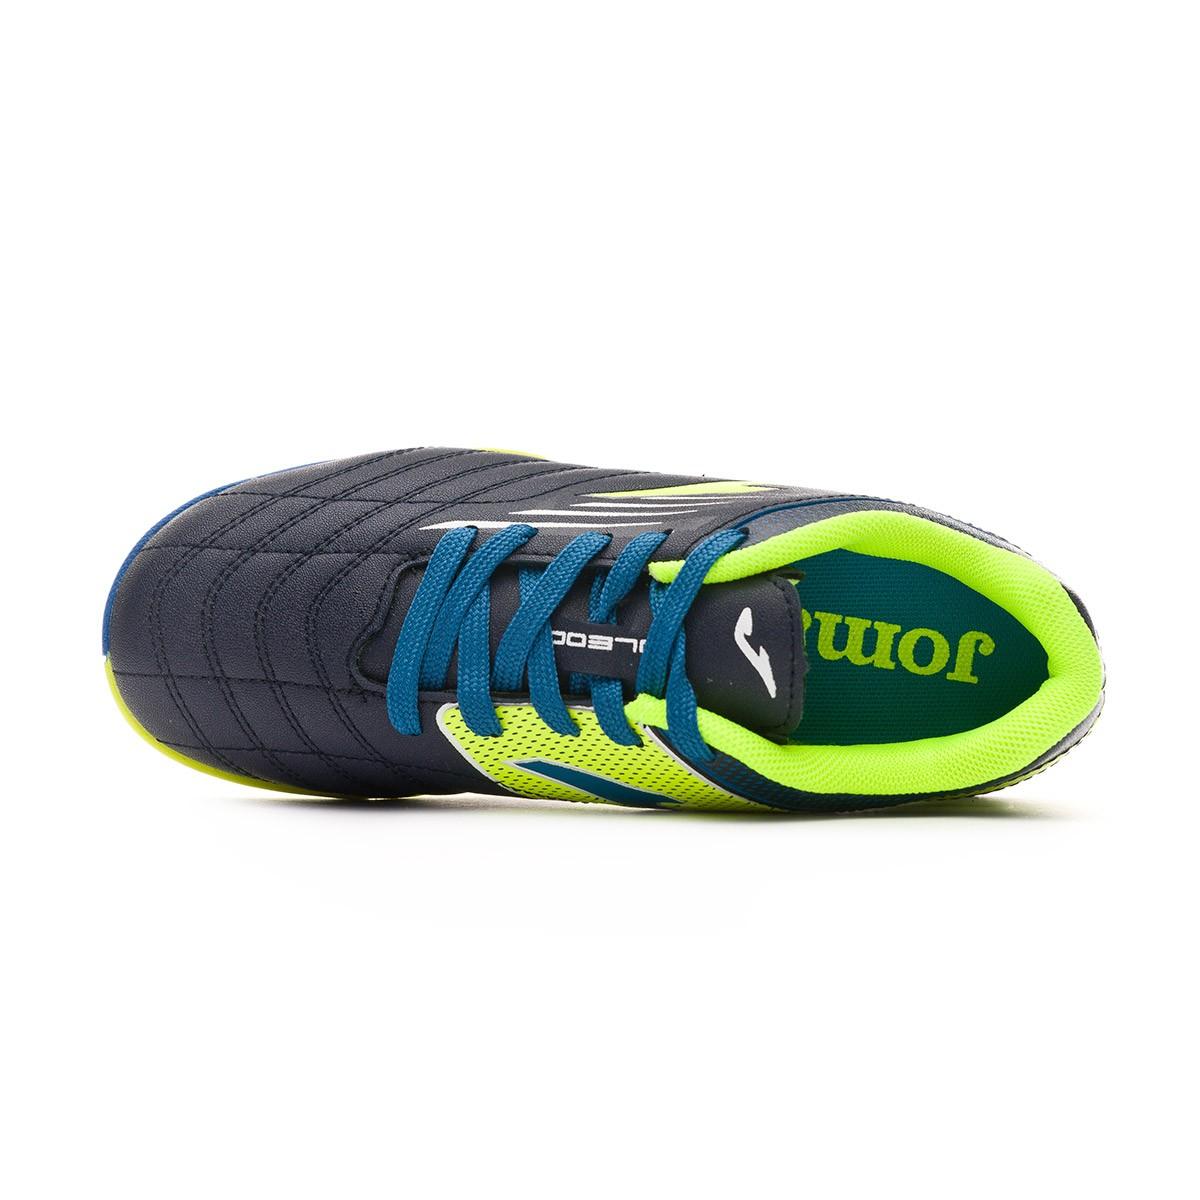 ... Zapatilla Toledo Turf Niño Navy-Lime. CATEGORY. Futsal · Futsal boots ·  Joma f4c4a2f7150a5